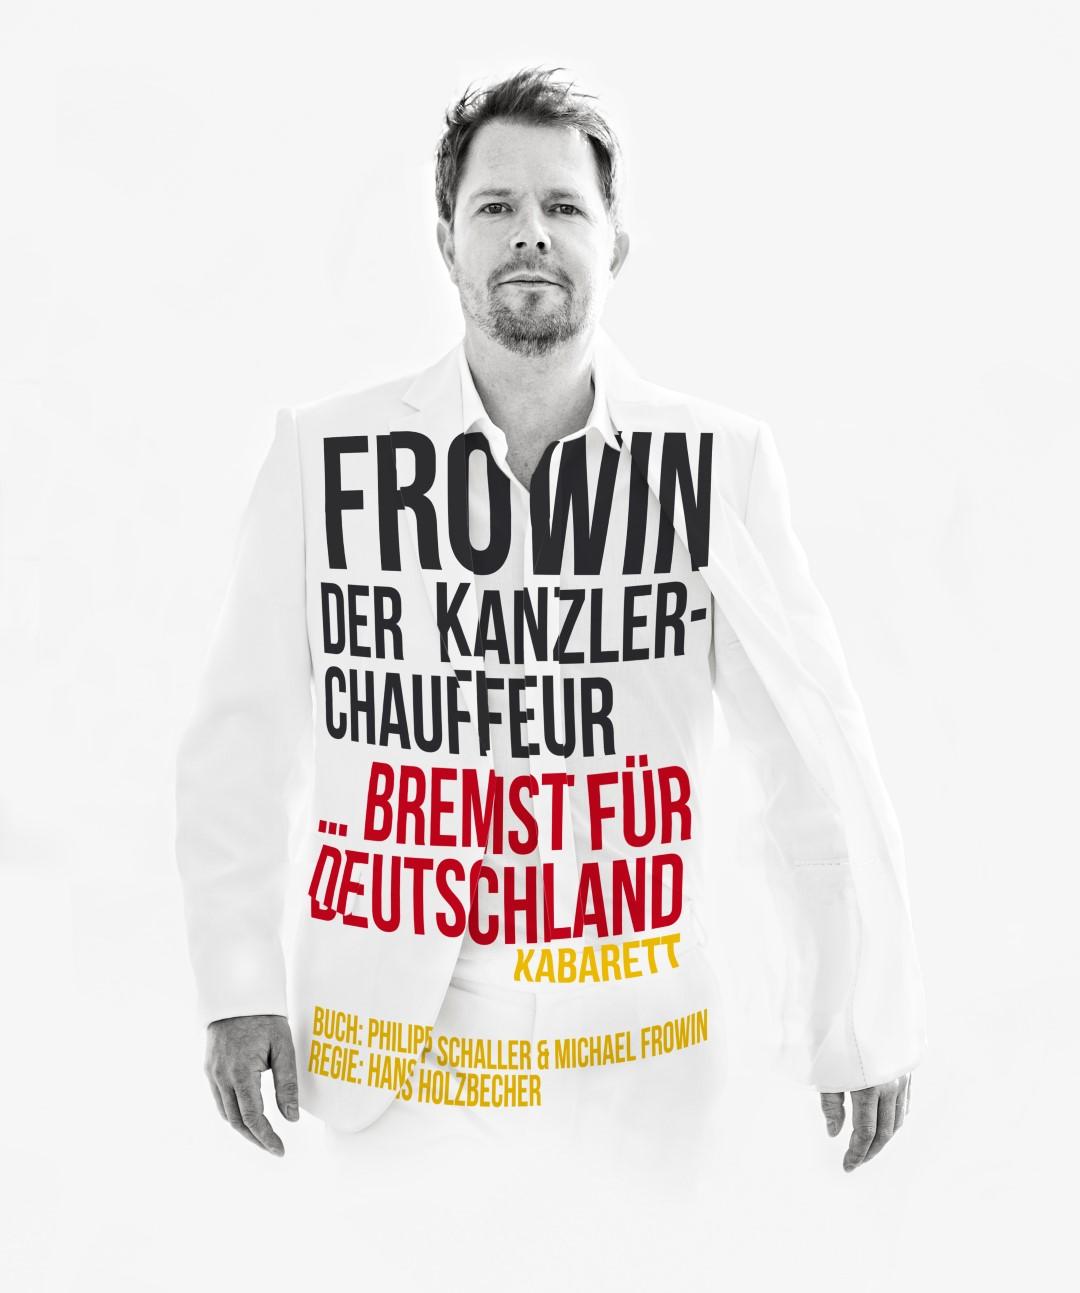 Preview: FROWIN - Der Kanzlerchauffeur